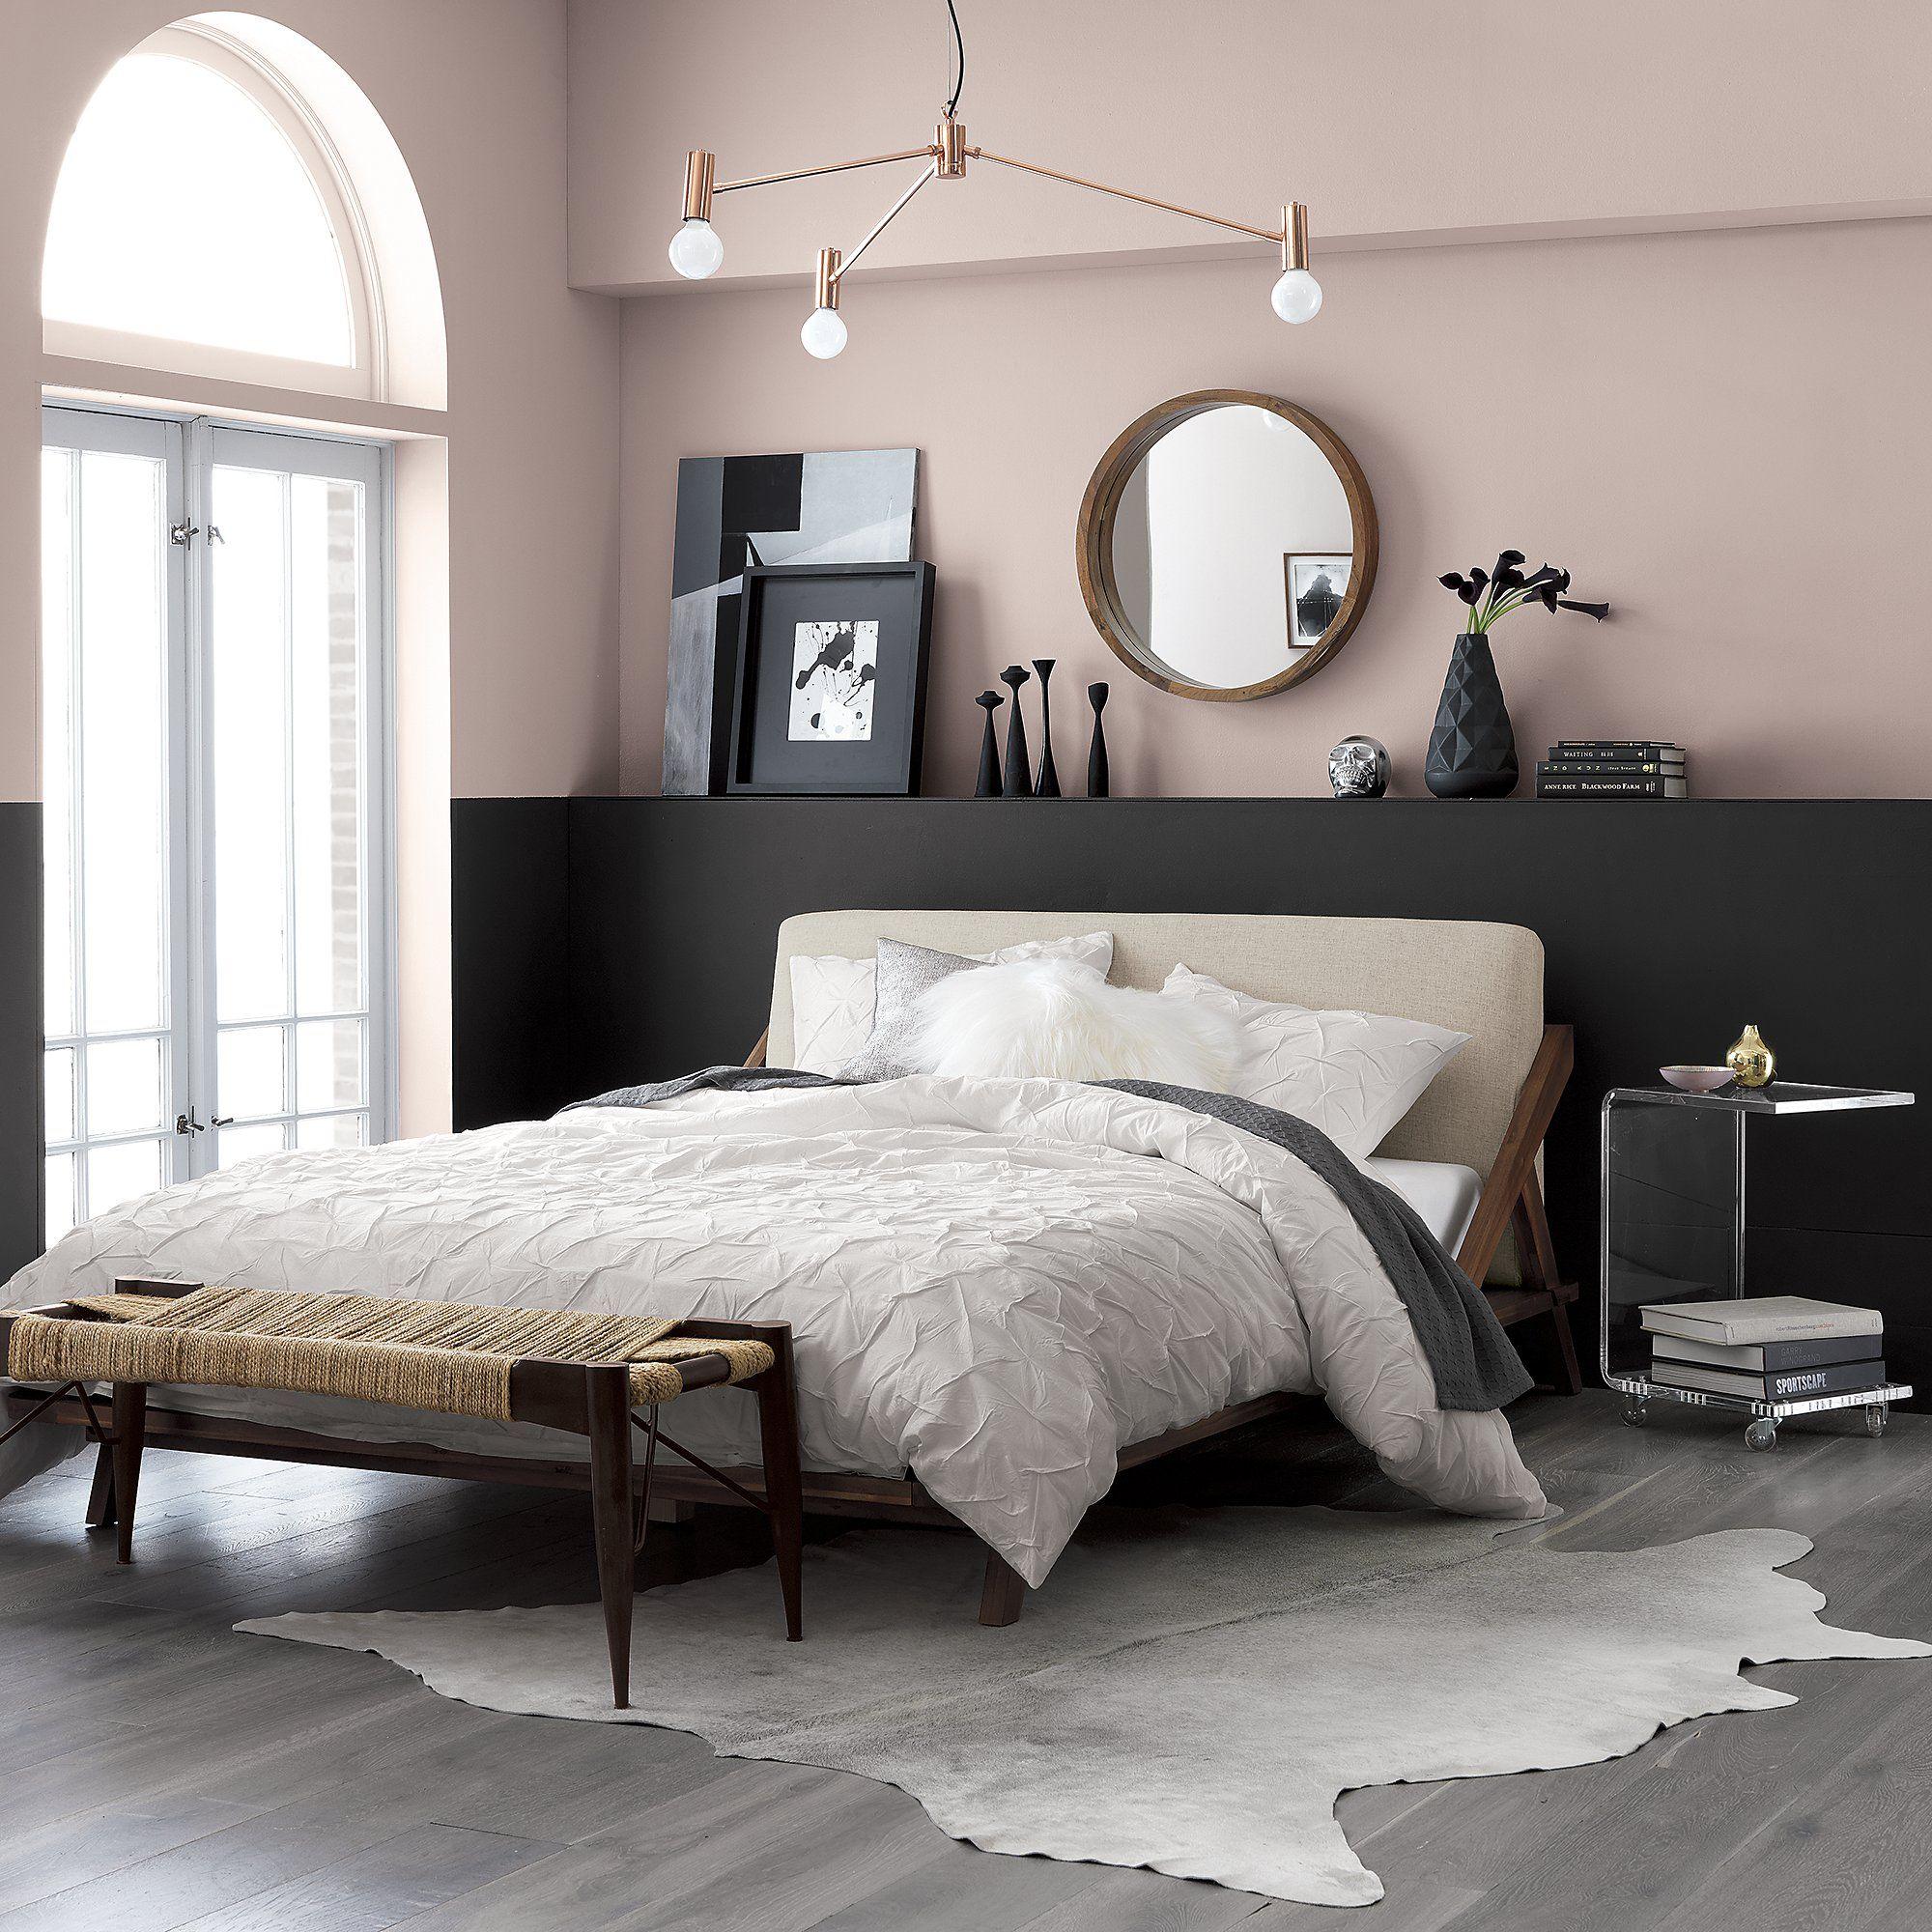 Light Cowhide Rug 5 X8 Reviews Cb2 Bedroom Interior Bedroom Design Home Decor Bedroom